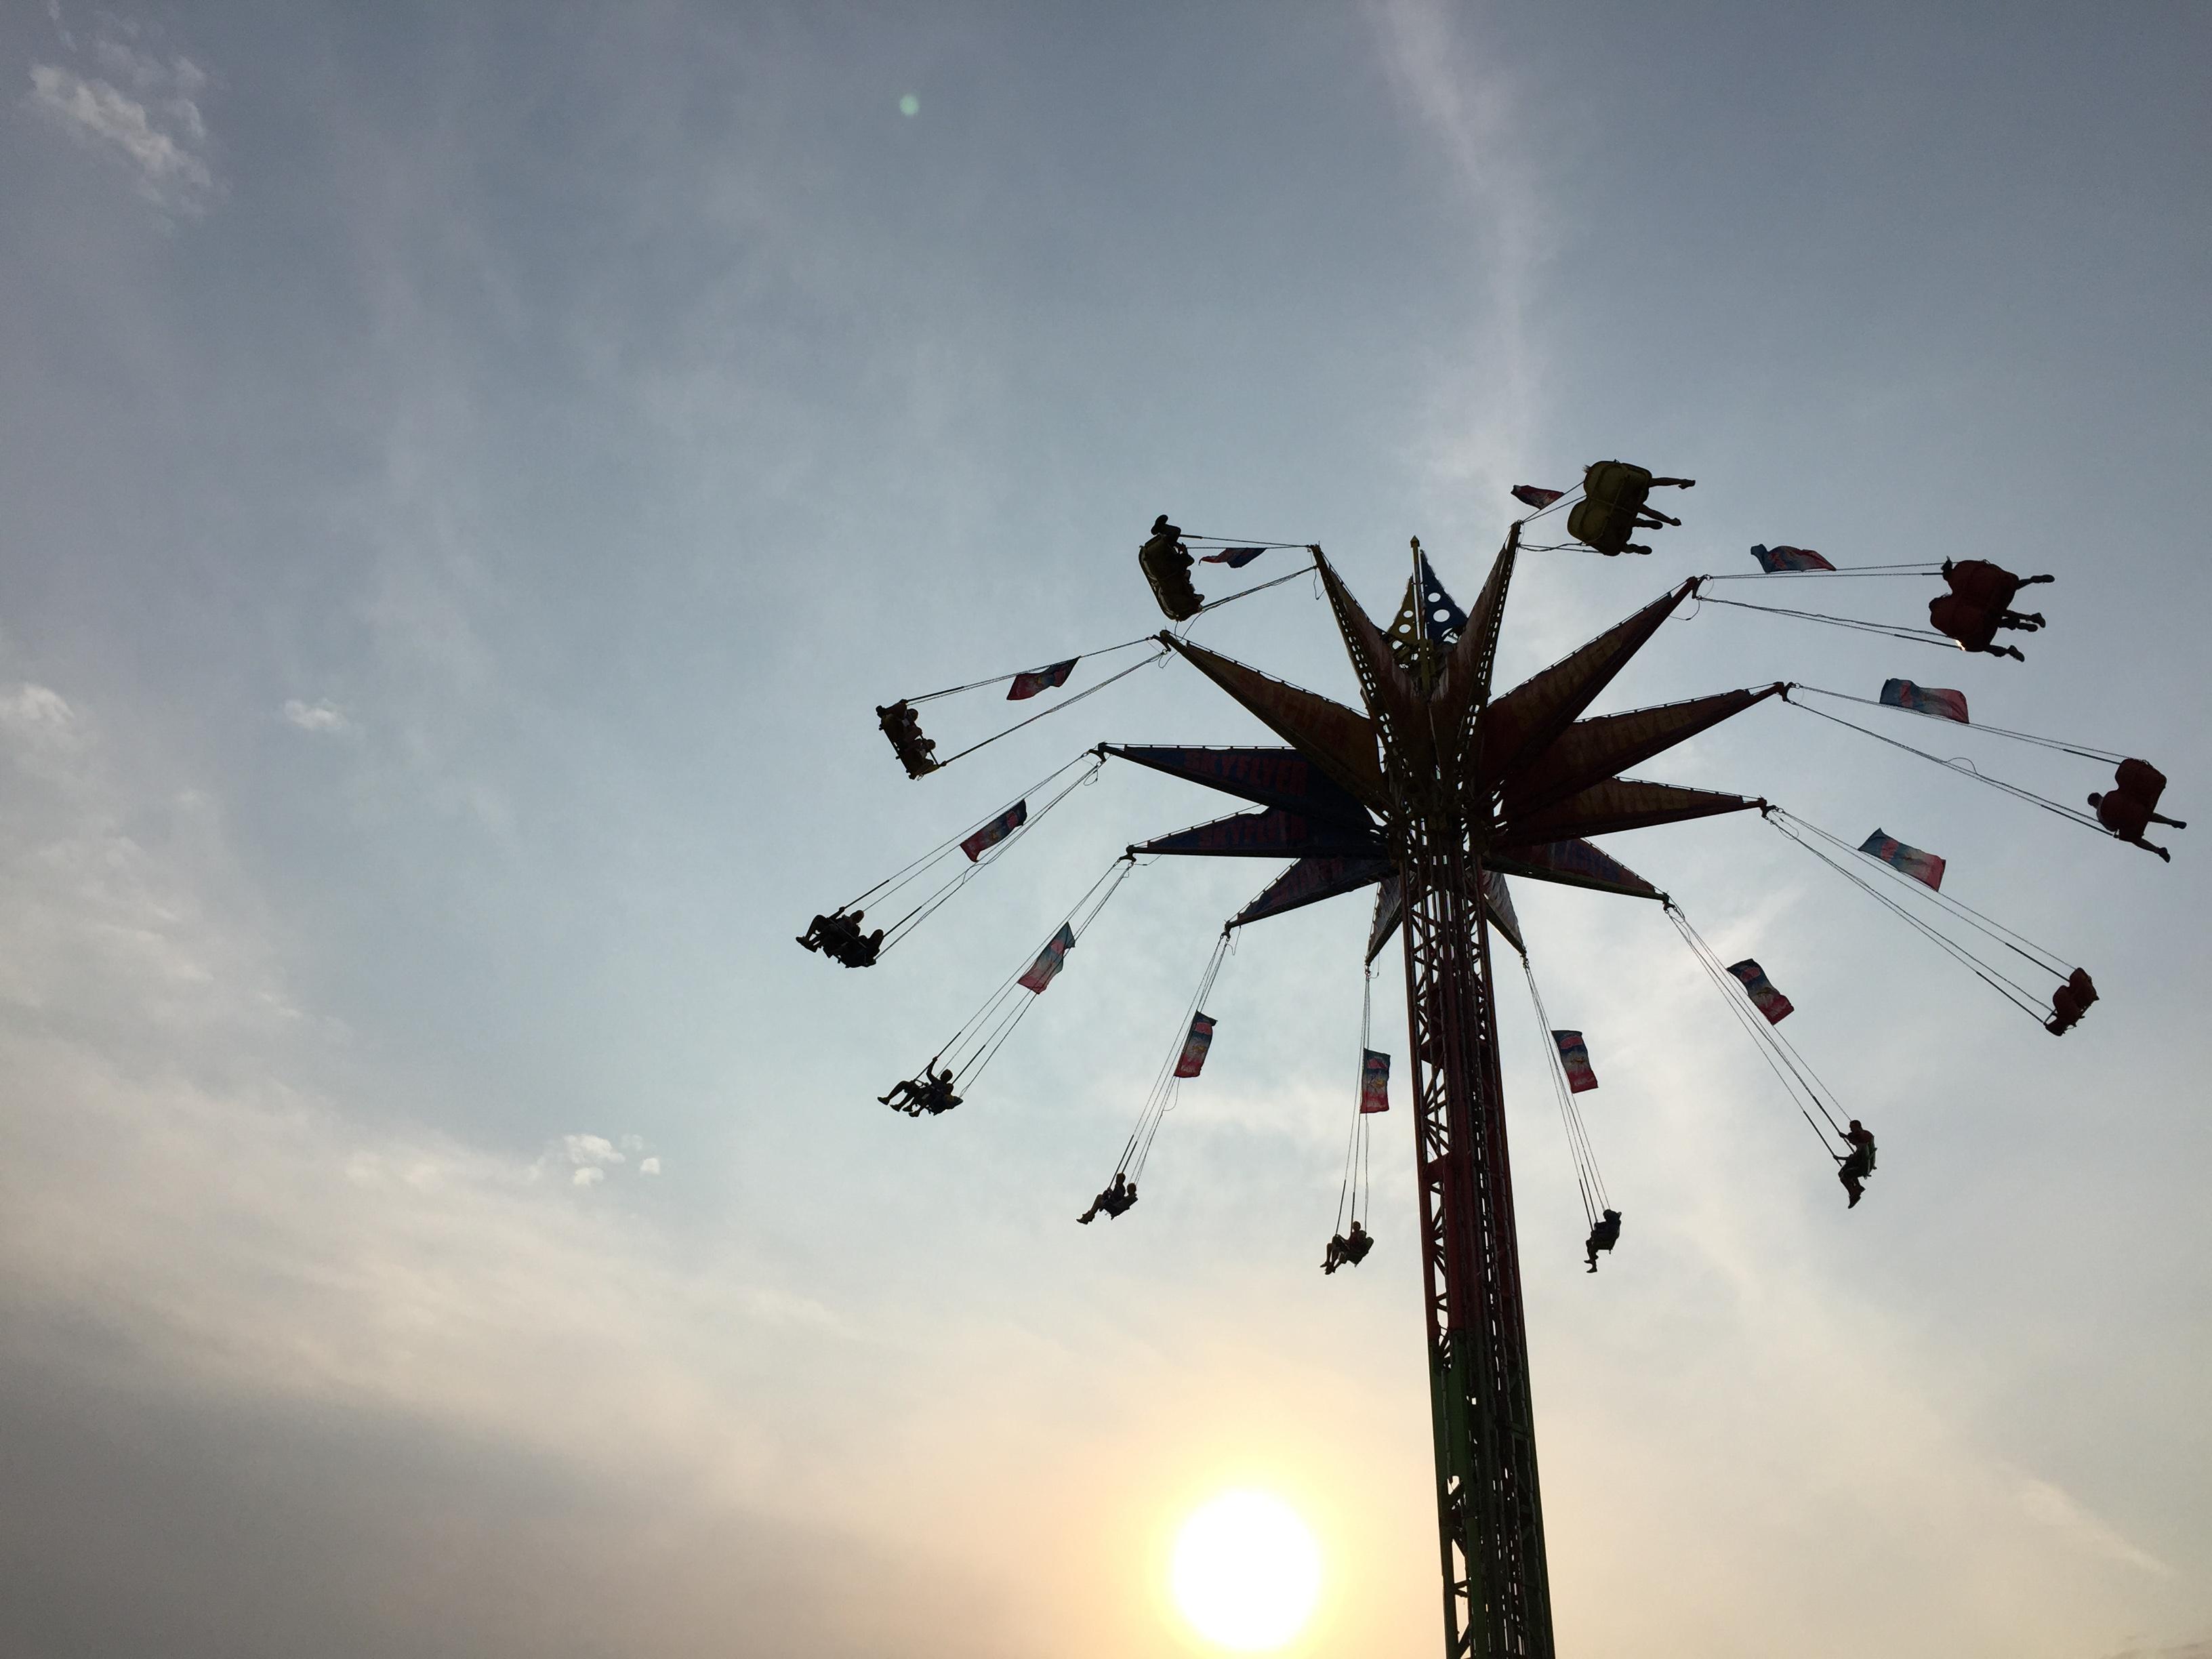 The fair is in full swing